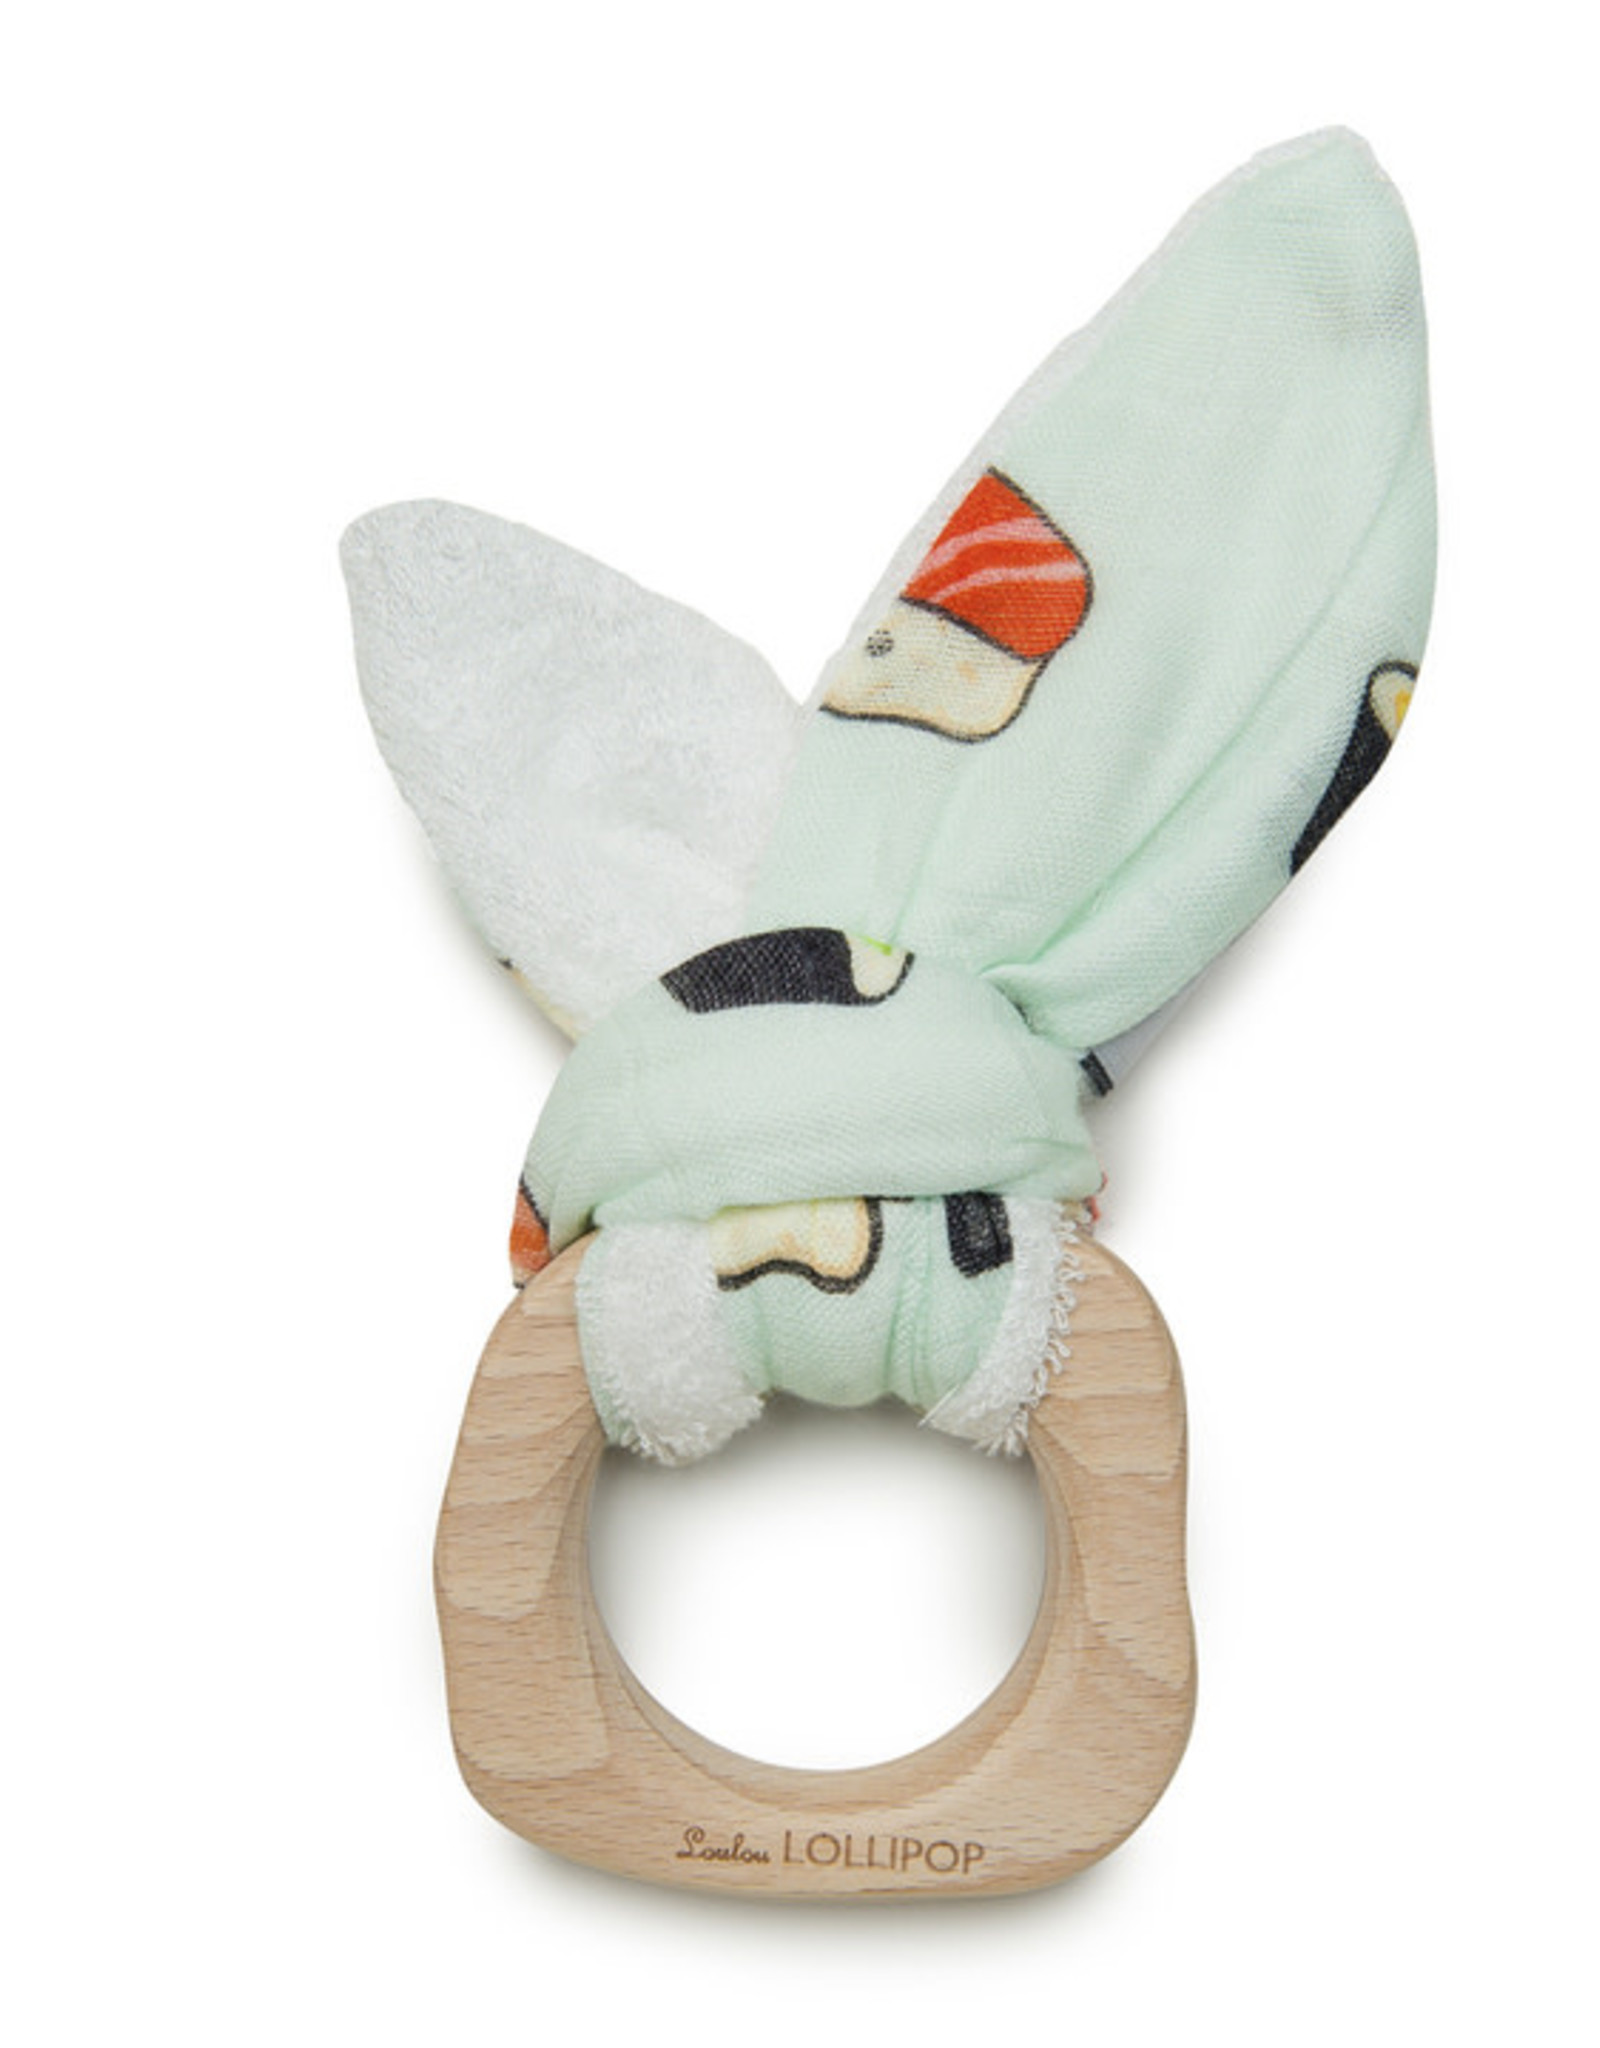 Loulou Lollipop Bunny Ear Teething Ring - Sushi